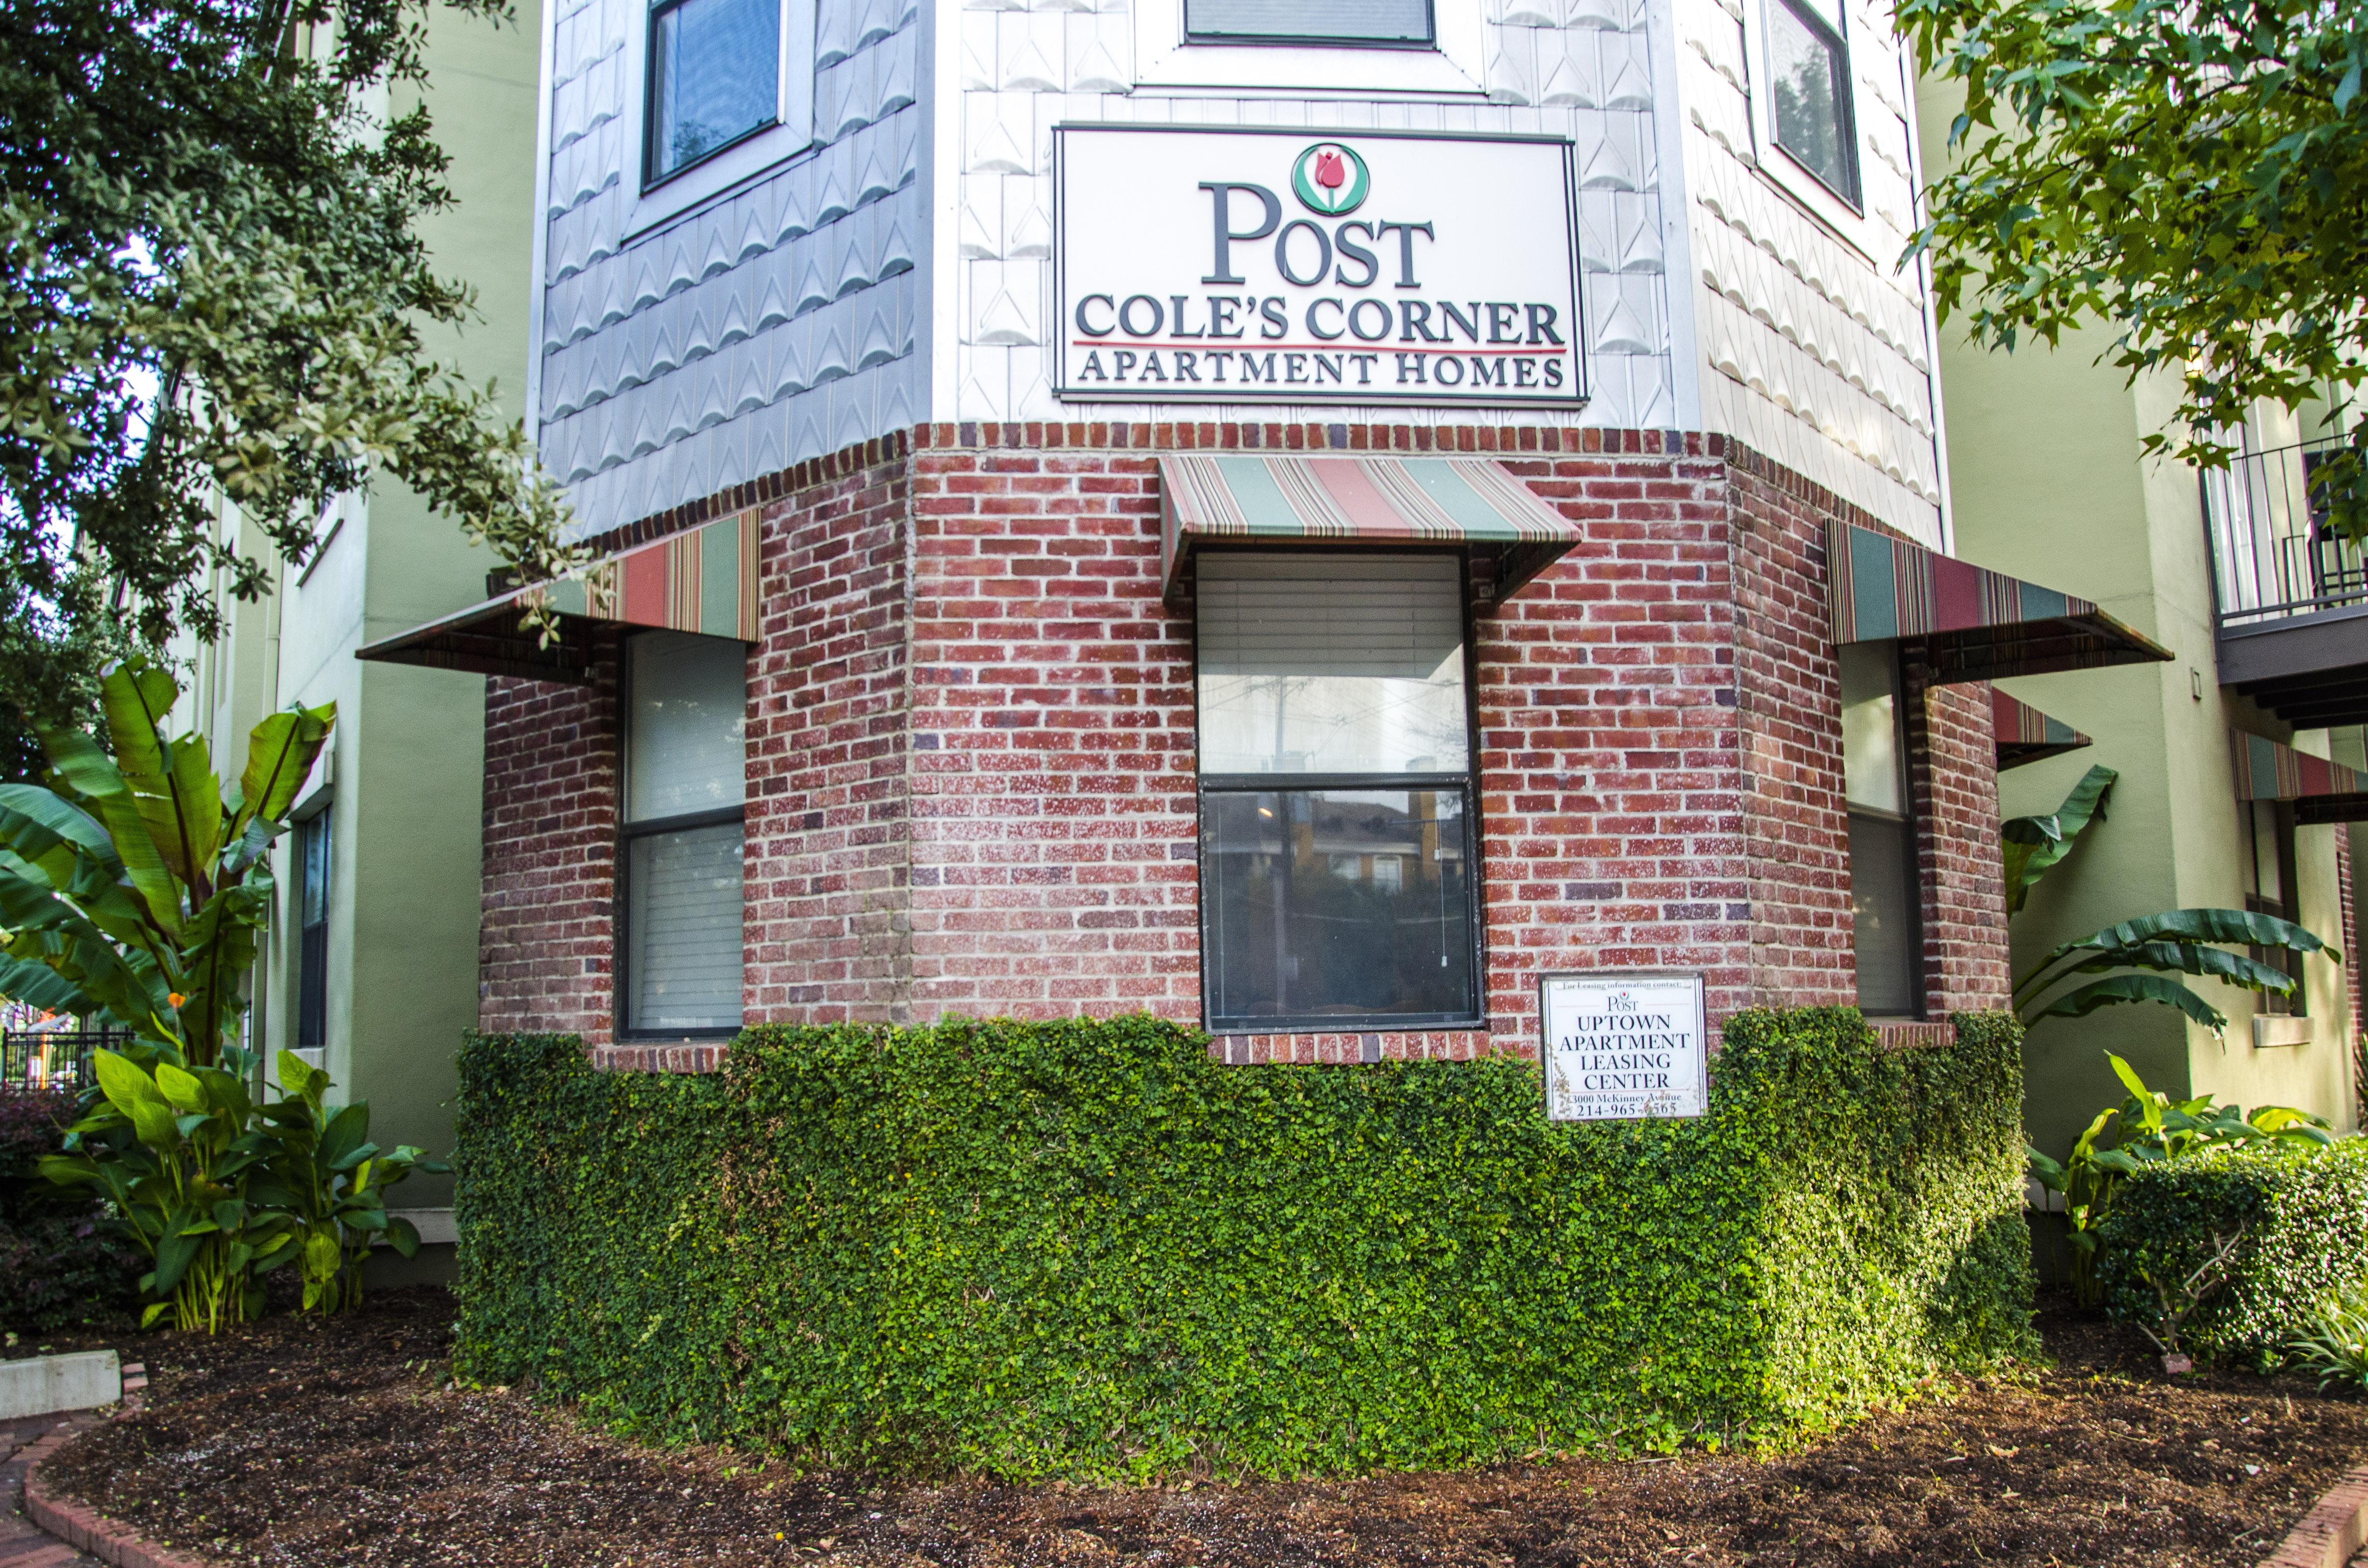 Post Coles Corner